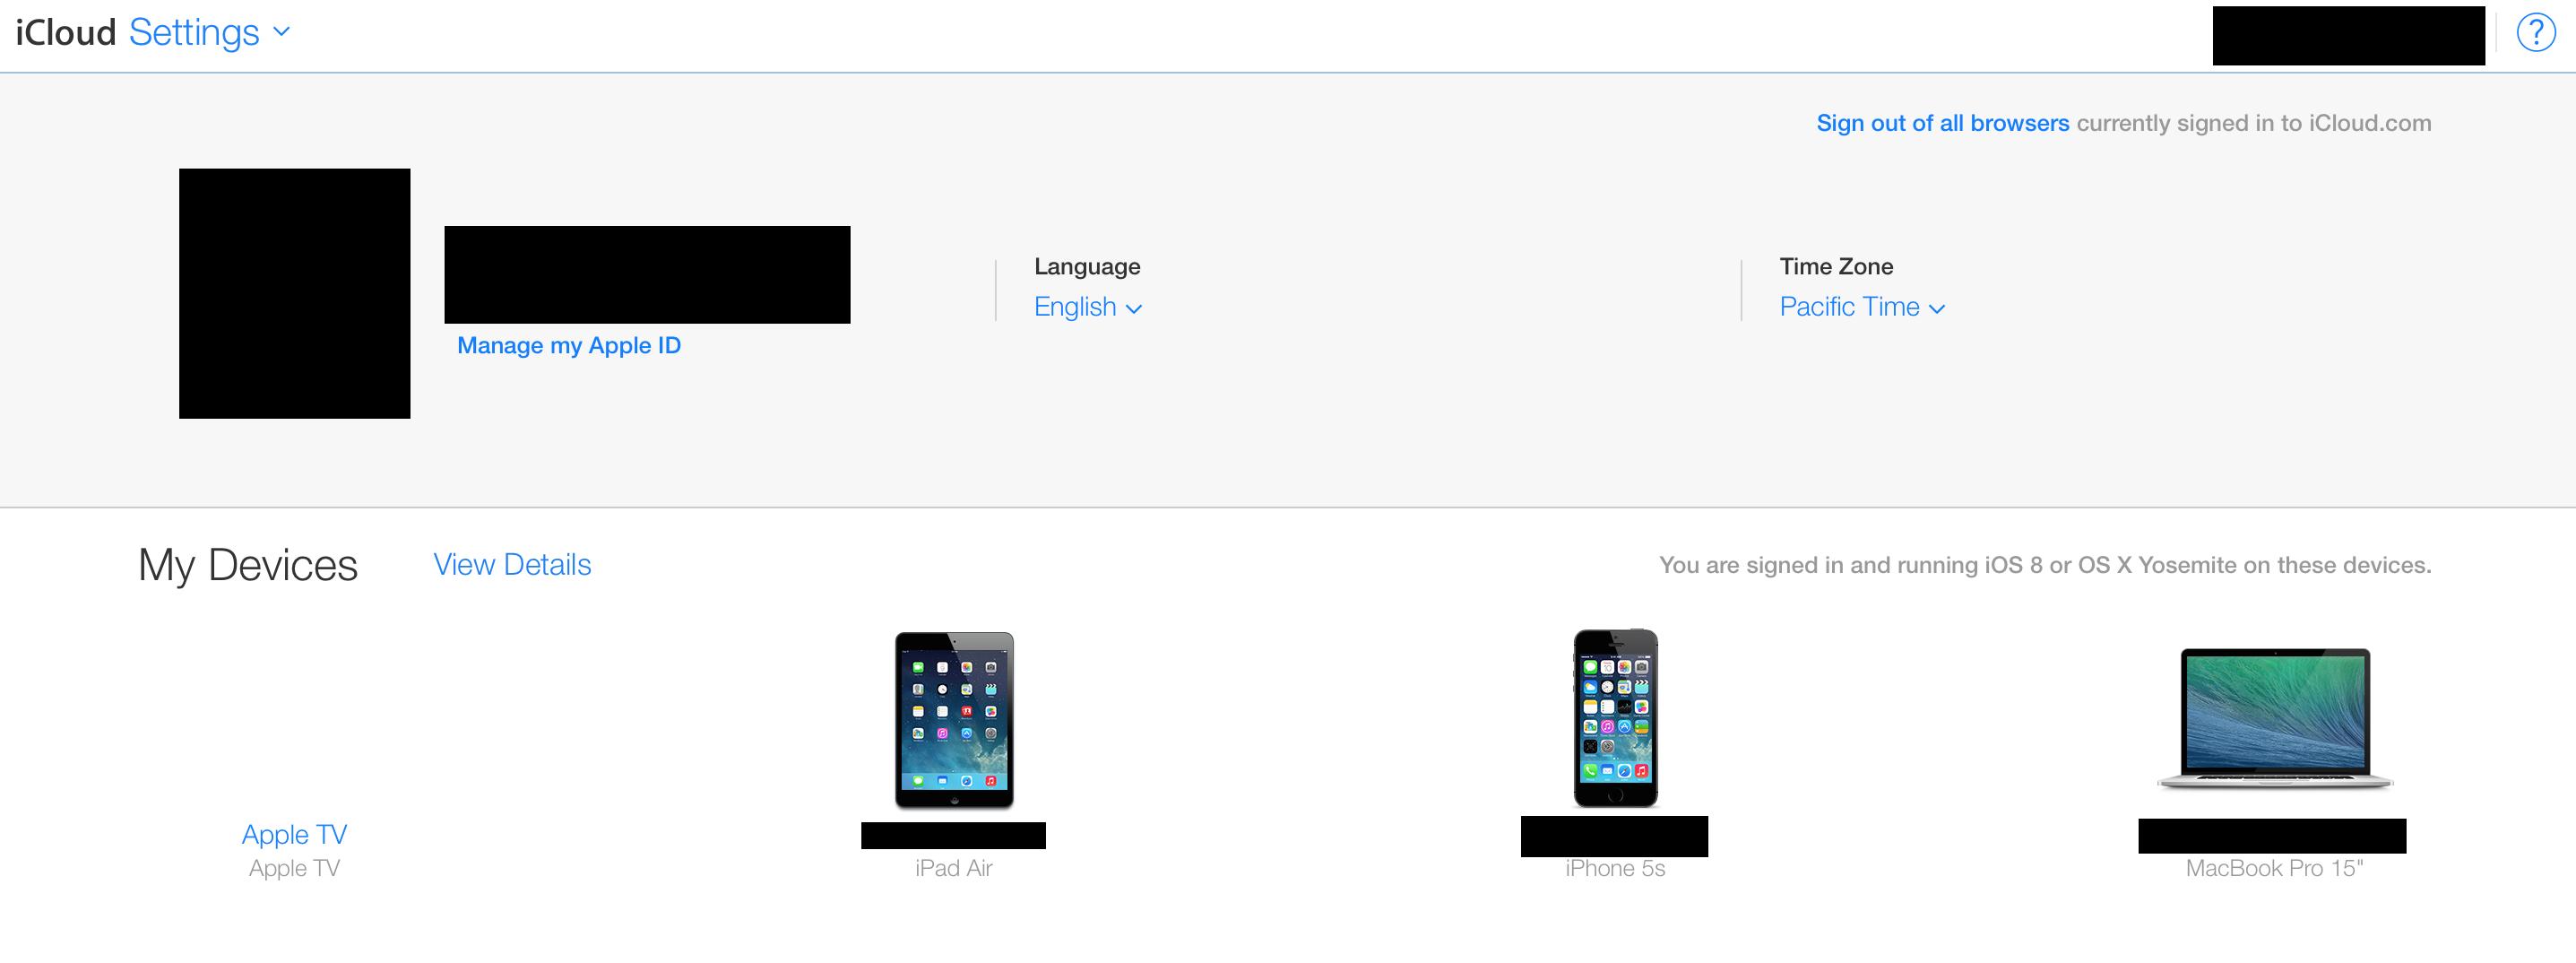 Screenshot 2014-09-10 17.47.36